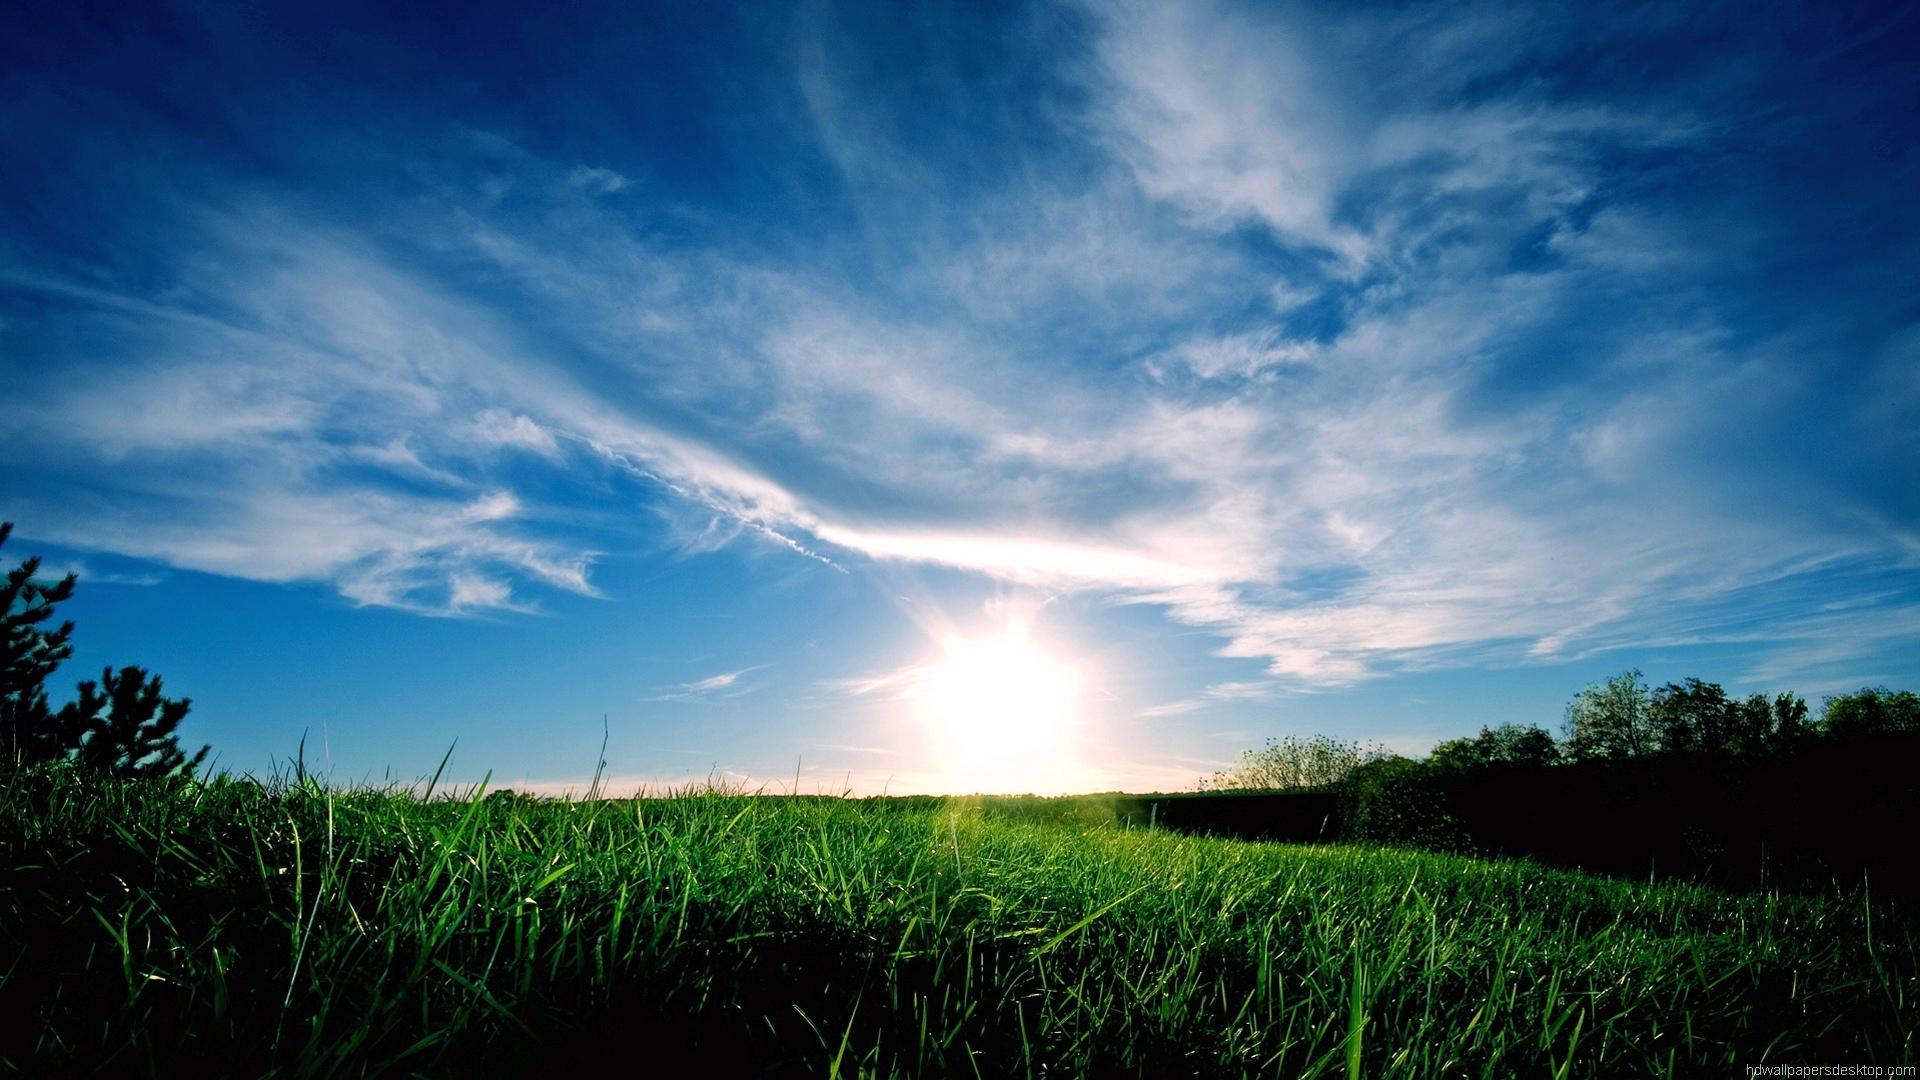 Beautiful Grassy Scene